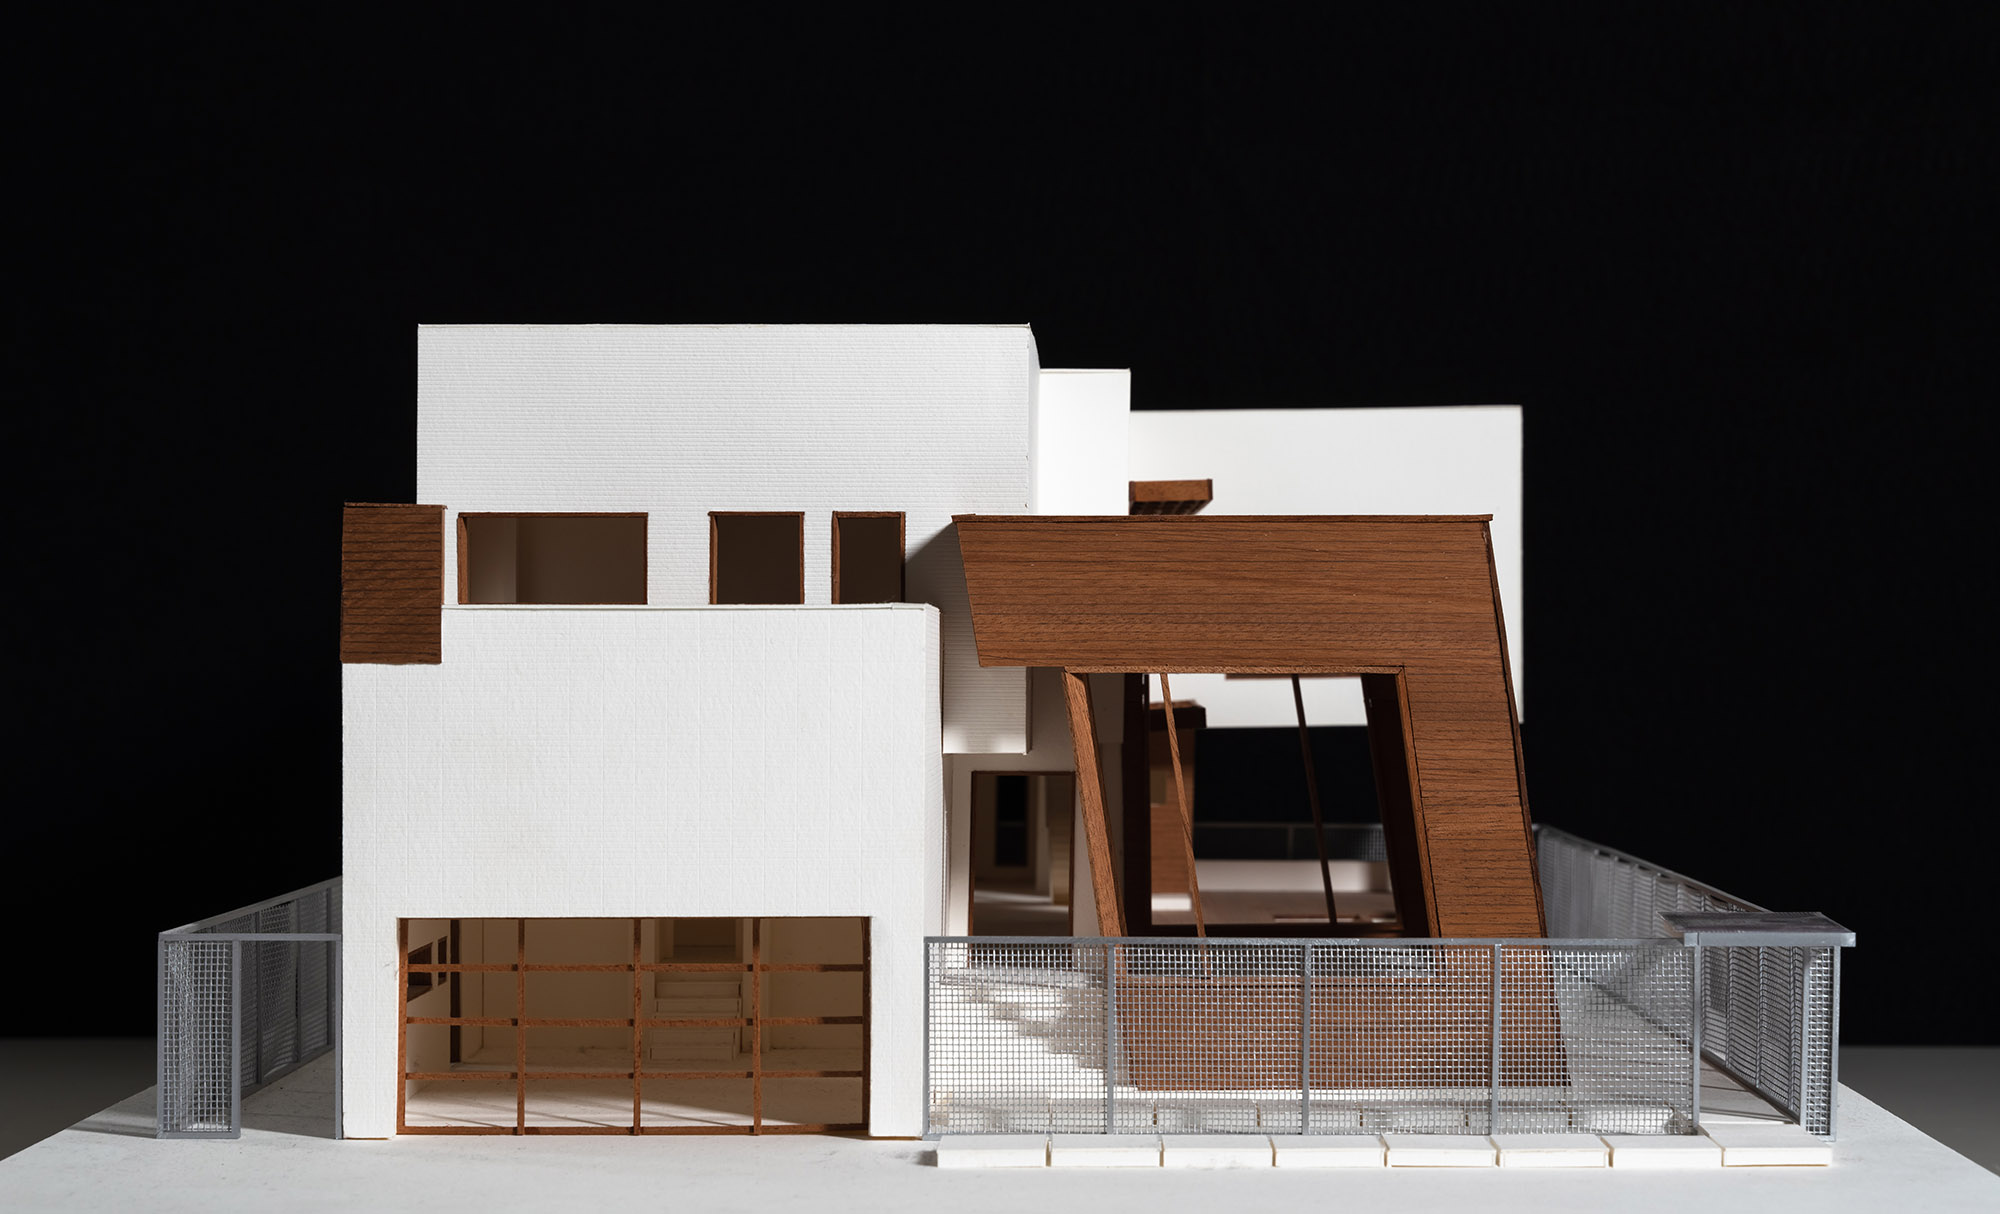 Mahvash-Santiago Residence